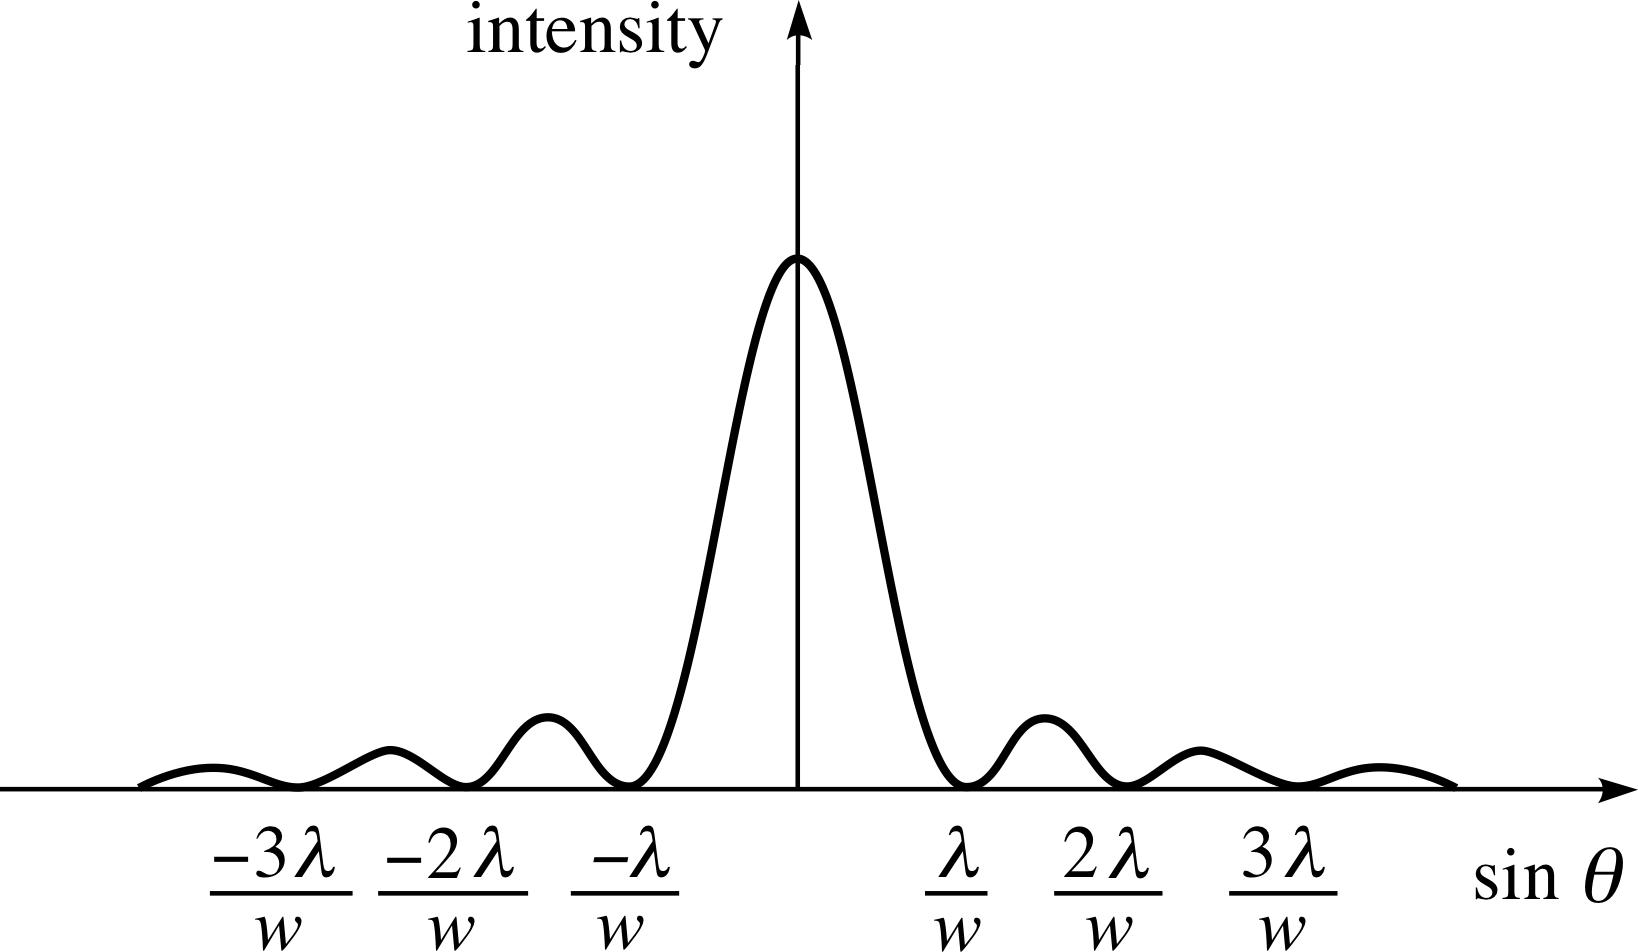 Pplato Flap Phys 61 Light A Wave Phenomenon Simple Free Body Diagram Galleryhipcom The Hippest Galleries Figure